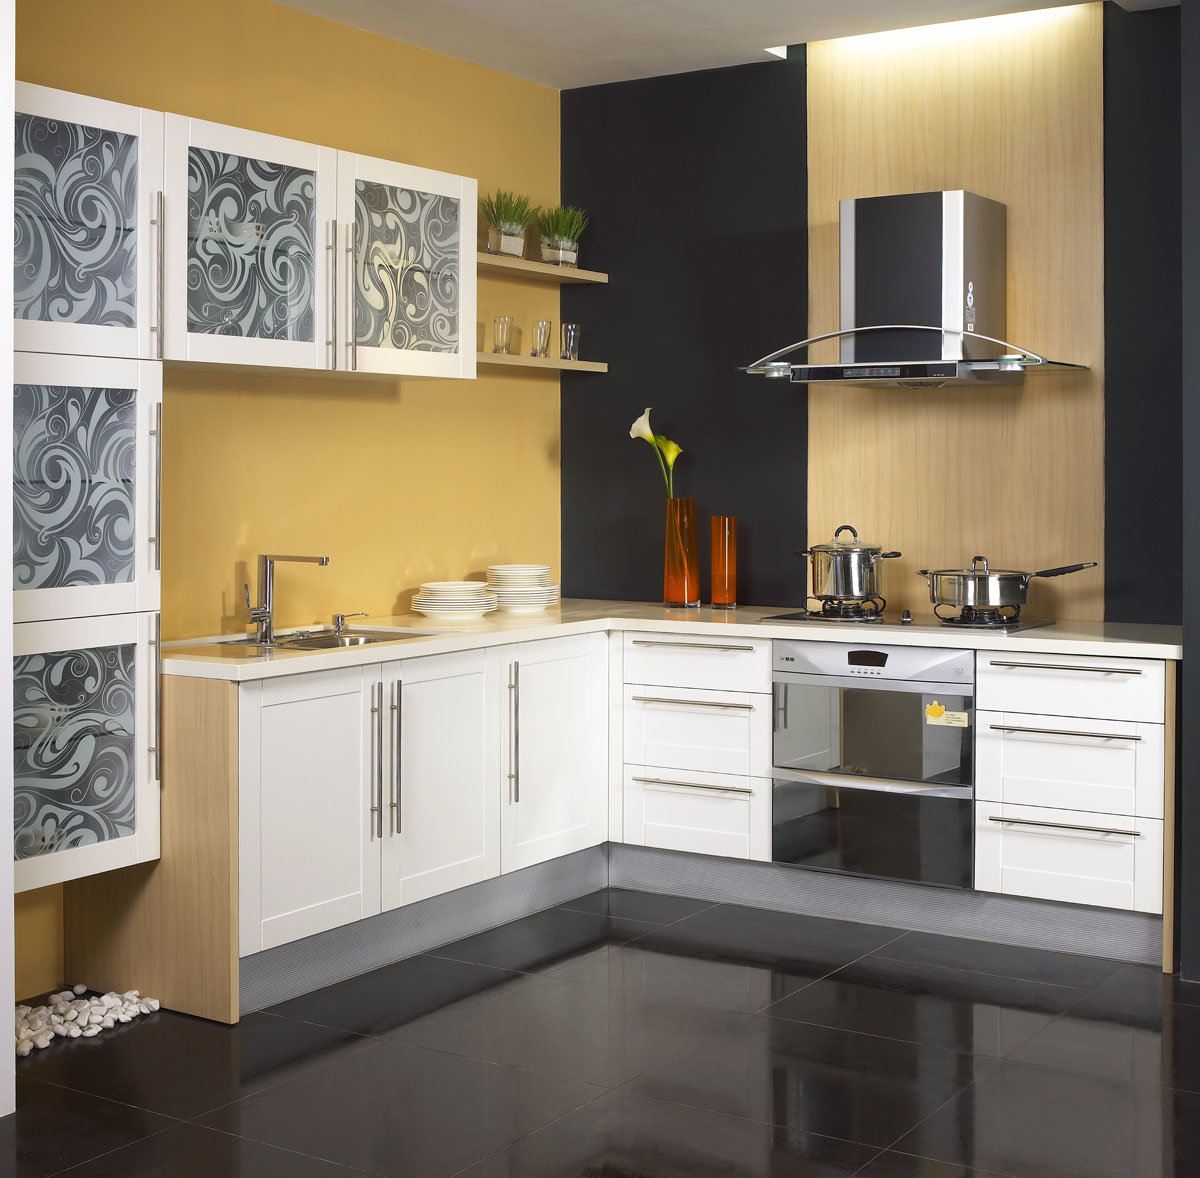 Foto de modulares muebles de cocina alto brillo uv de for Muebles de cocina de madera modernos